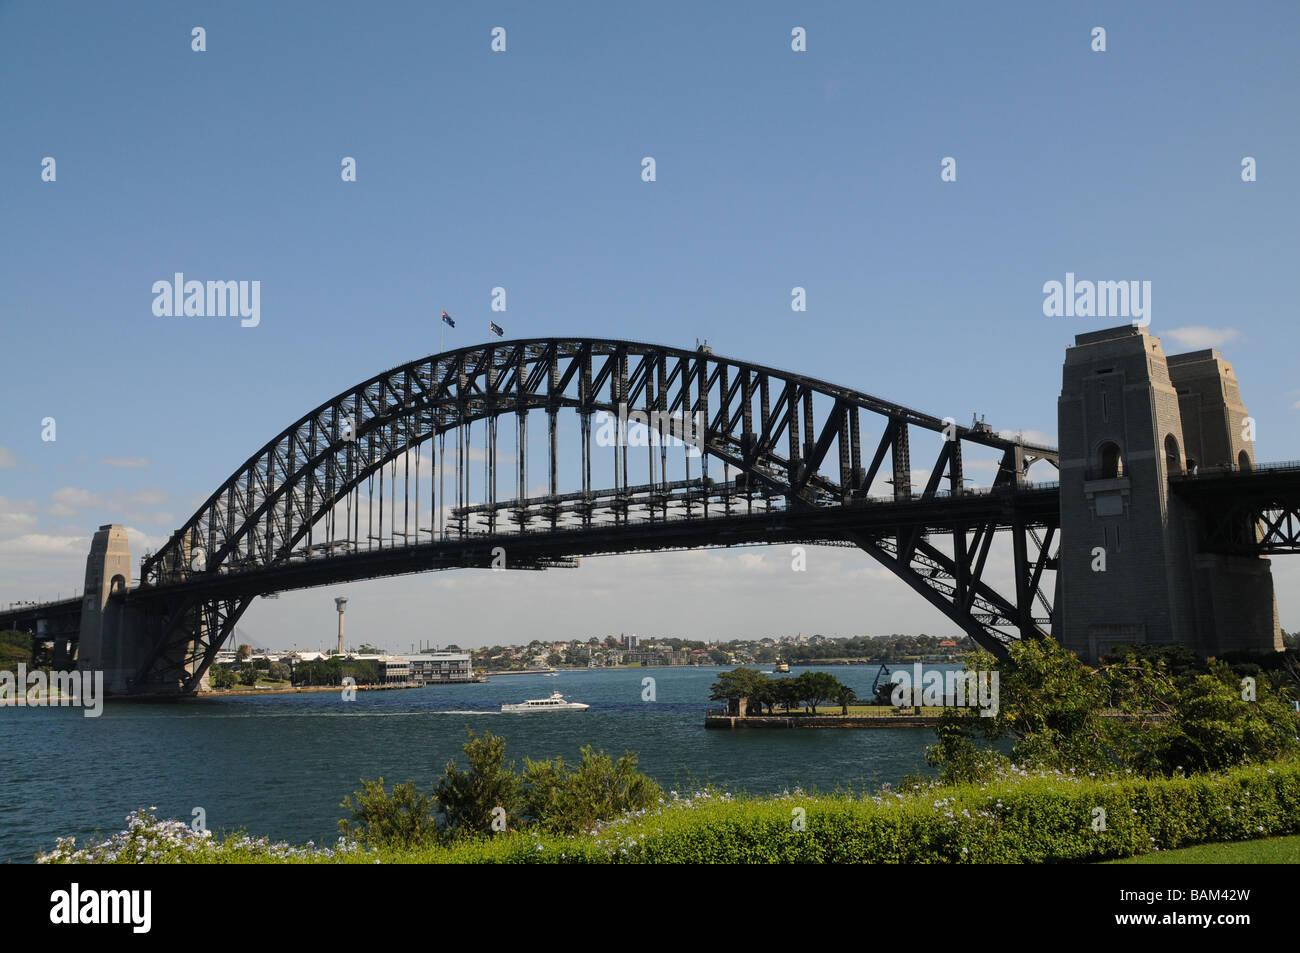 Three And A Half Year Stockfotos & Three And A Half Year Bilder - Alamy